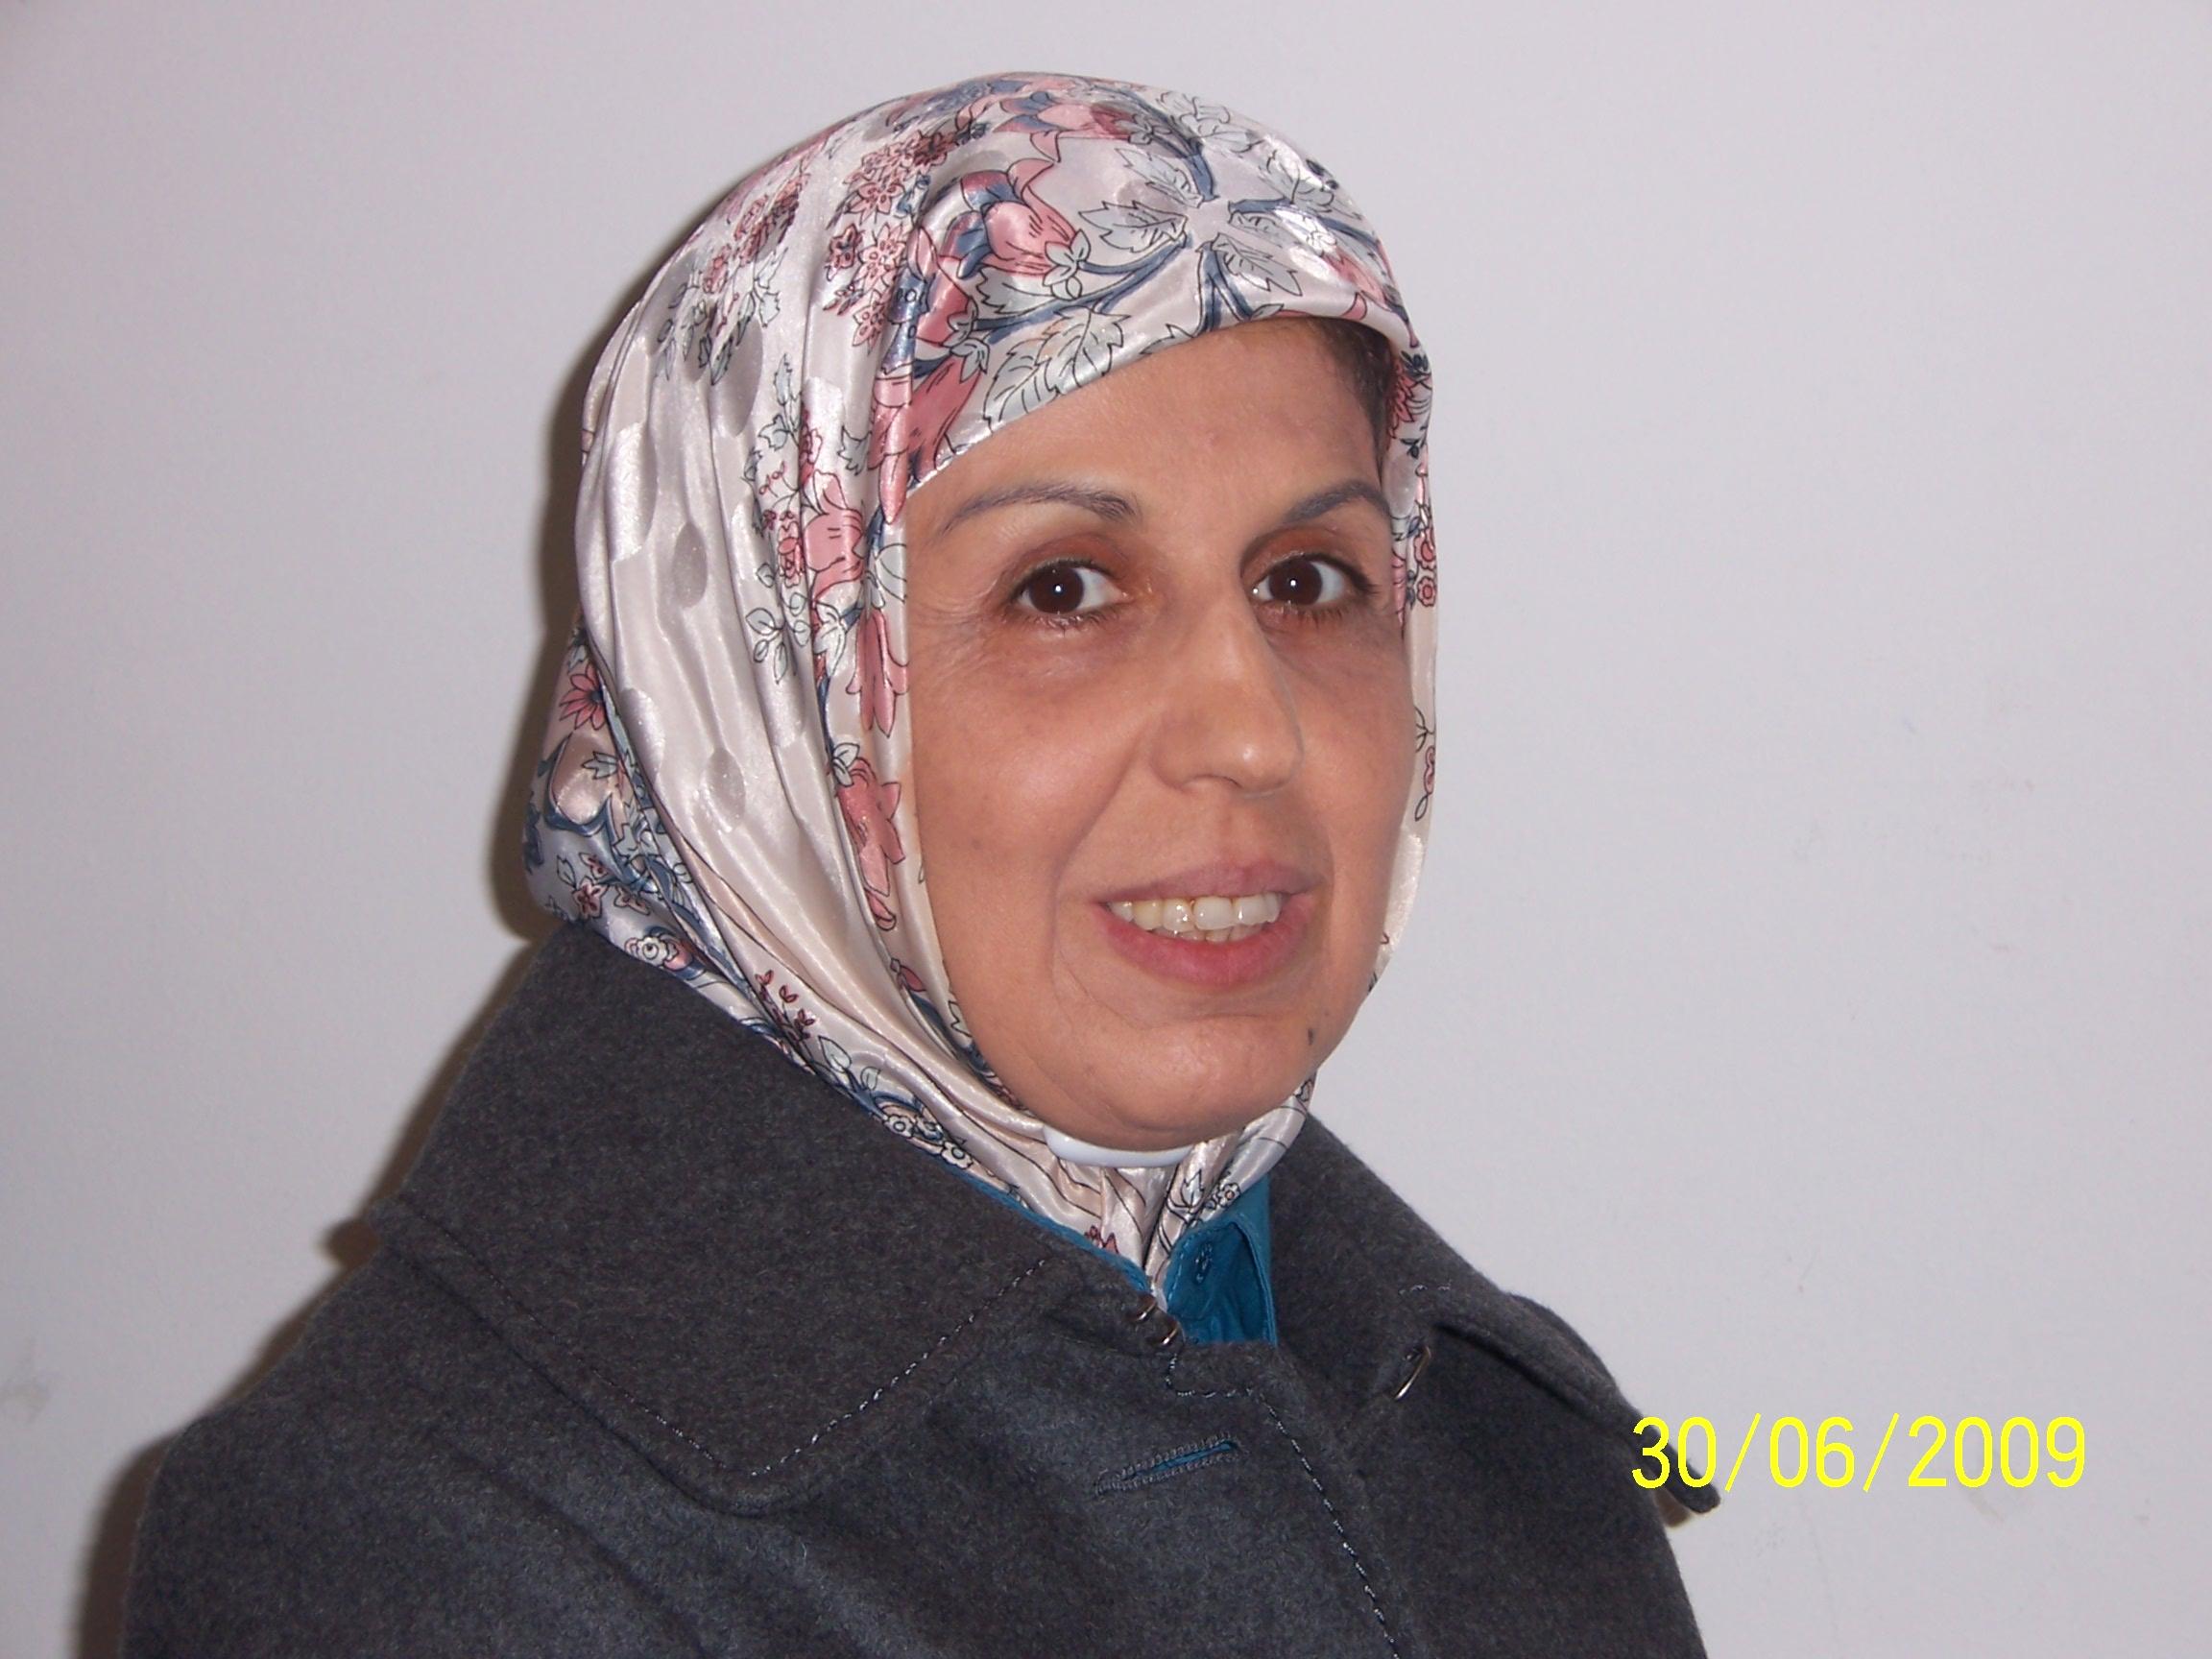 Dr. Rifa Jarallah El-Khozondar